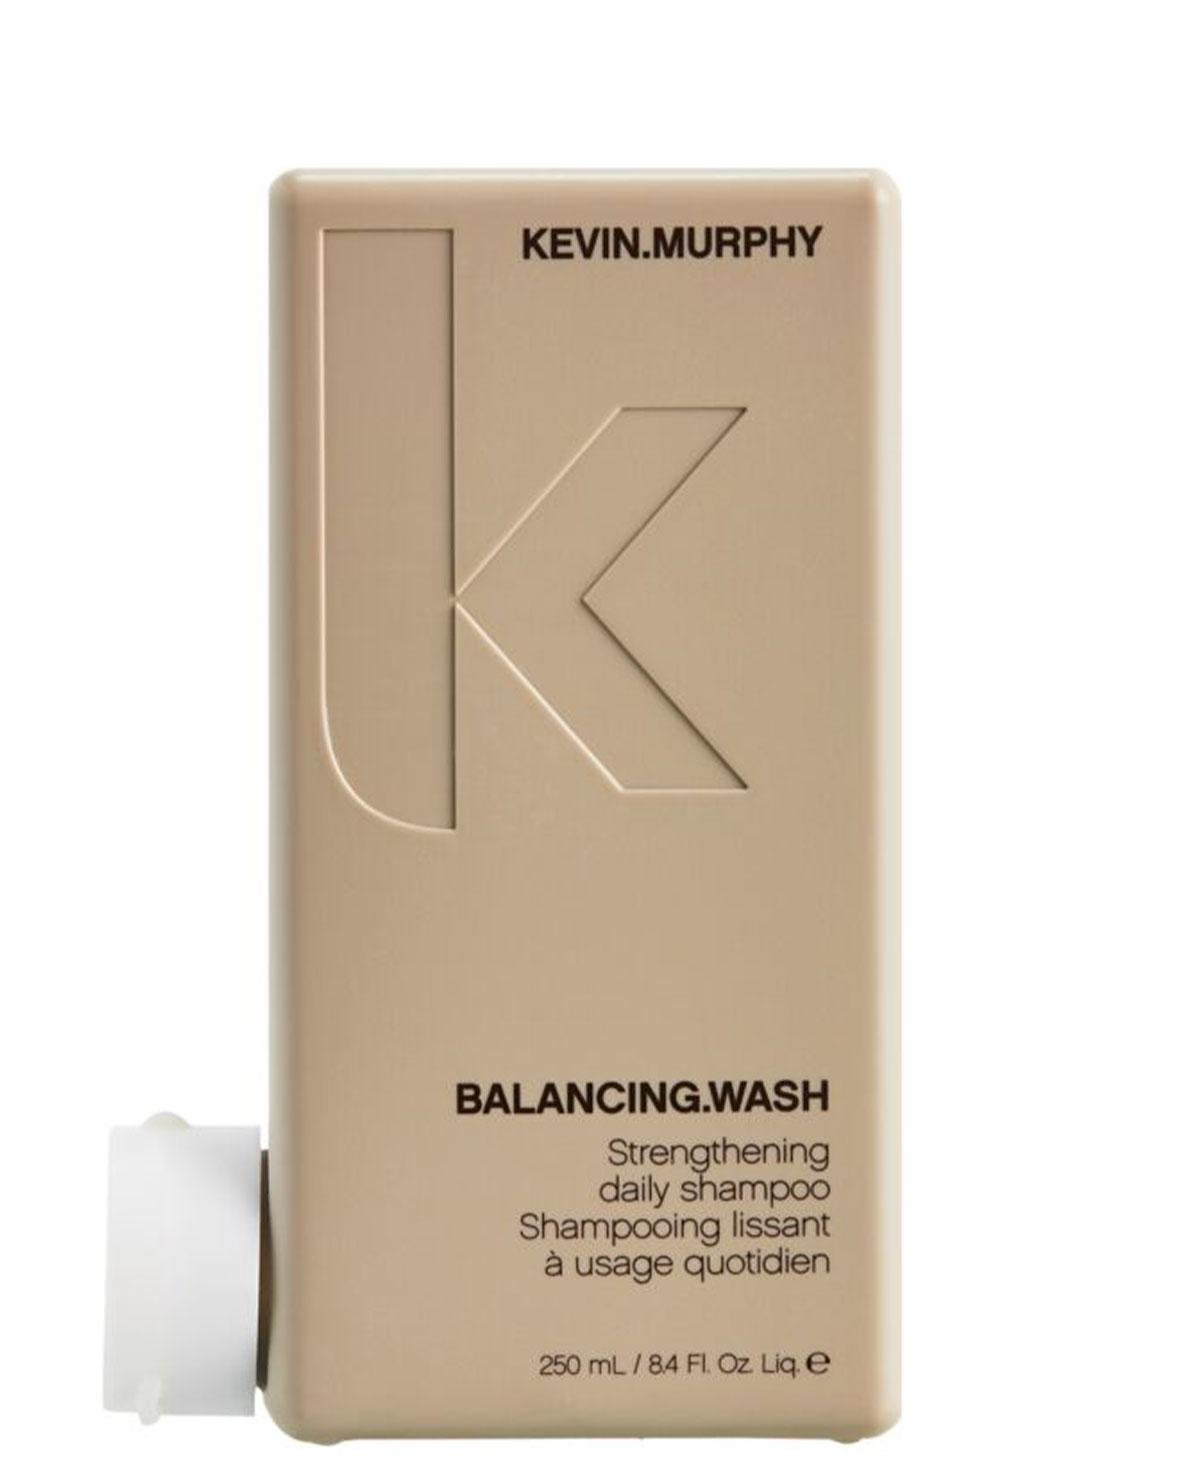 Kevin.Murphy BALANCING.WASH 250ml